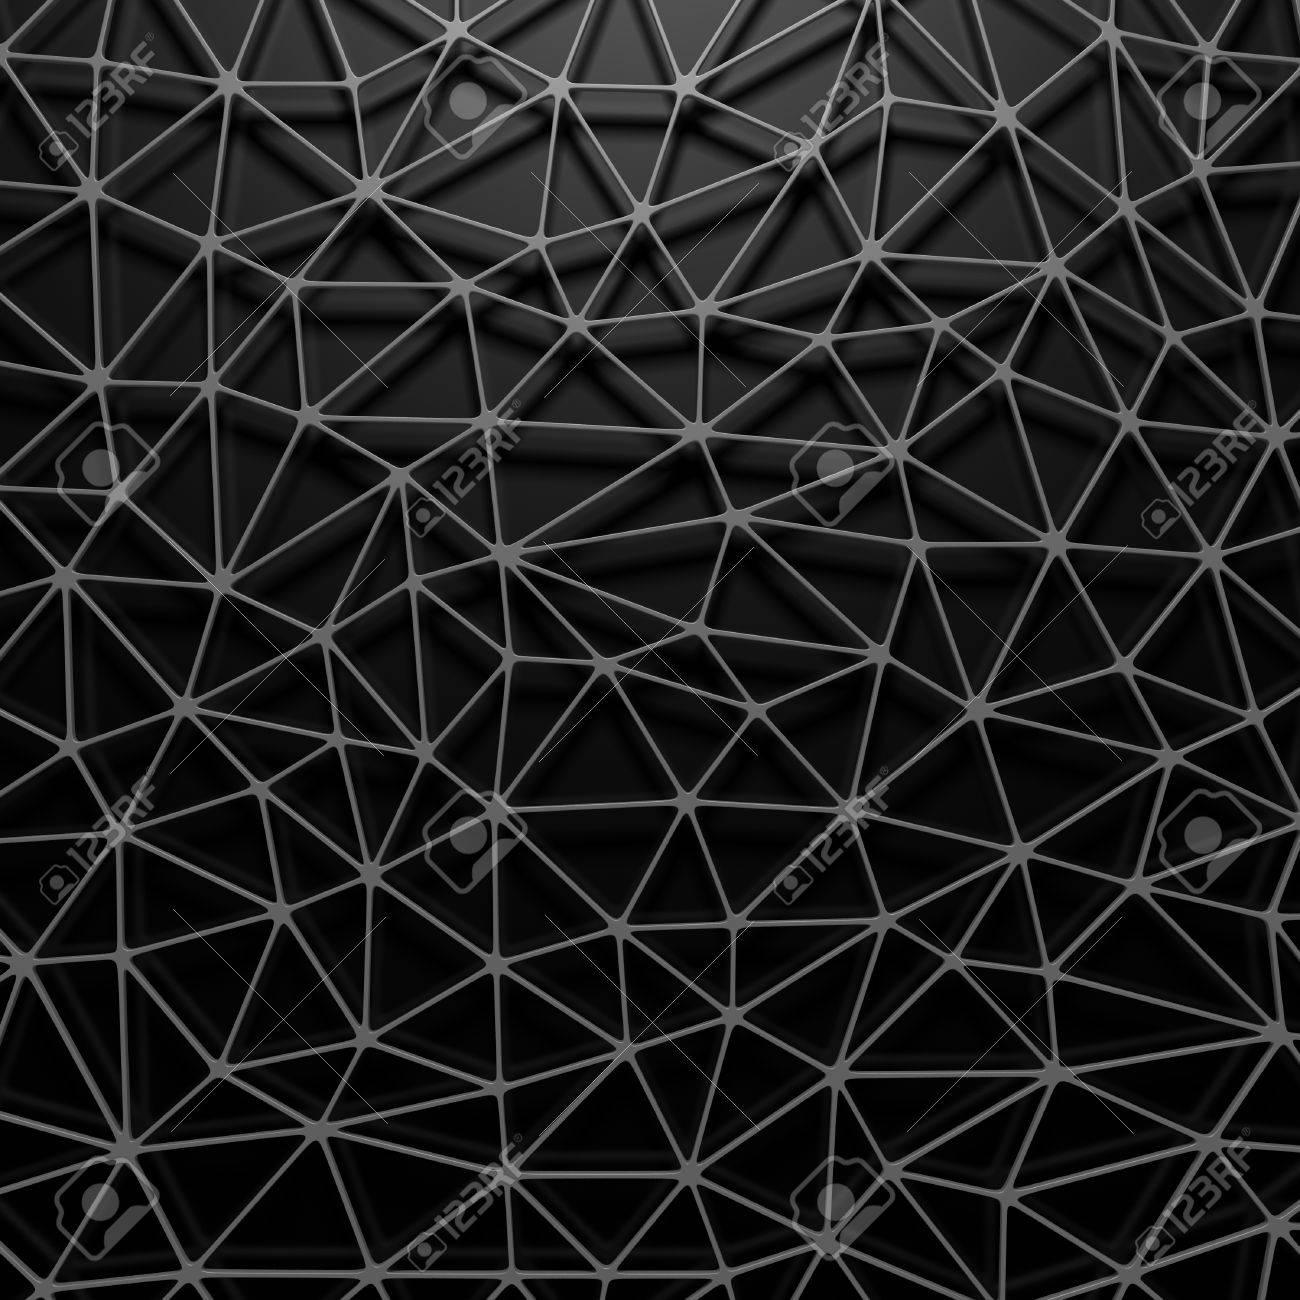 Fond D Écran Noir fond d'écran noir de motifs métalliques métalliques triangulaires